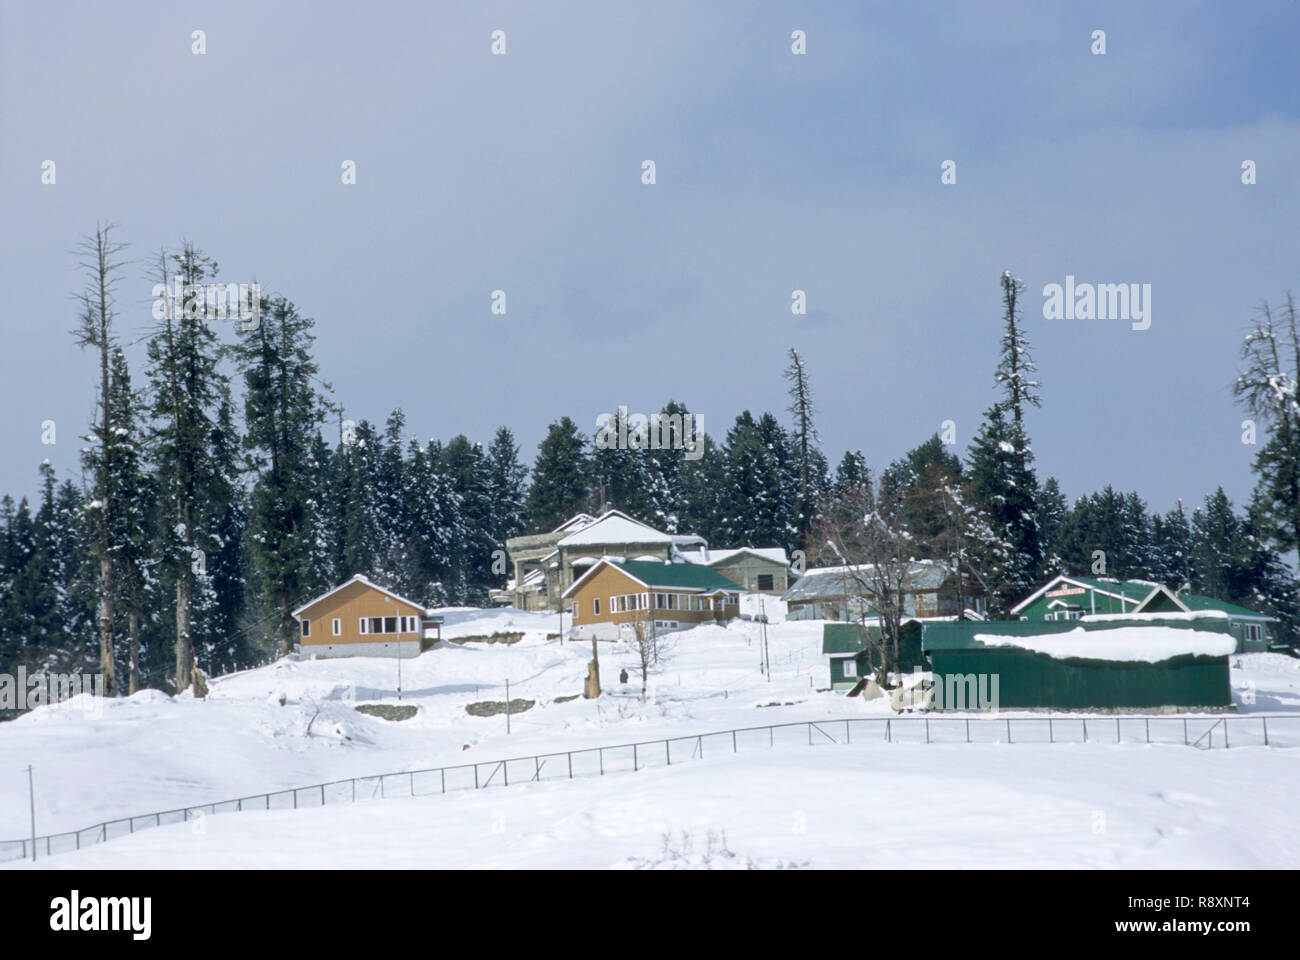 winter season in gulmarg, jammu and kashmir, india Stock